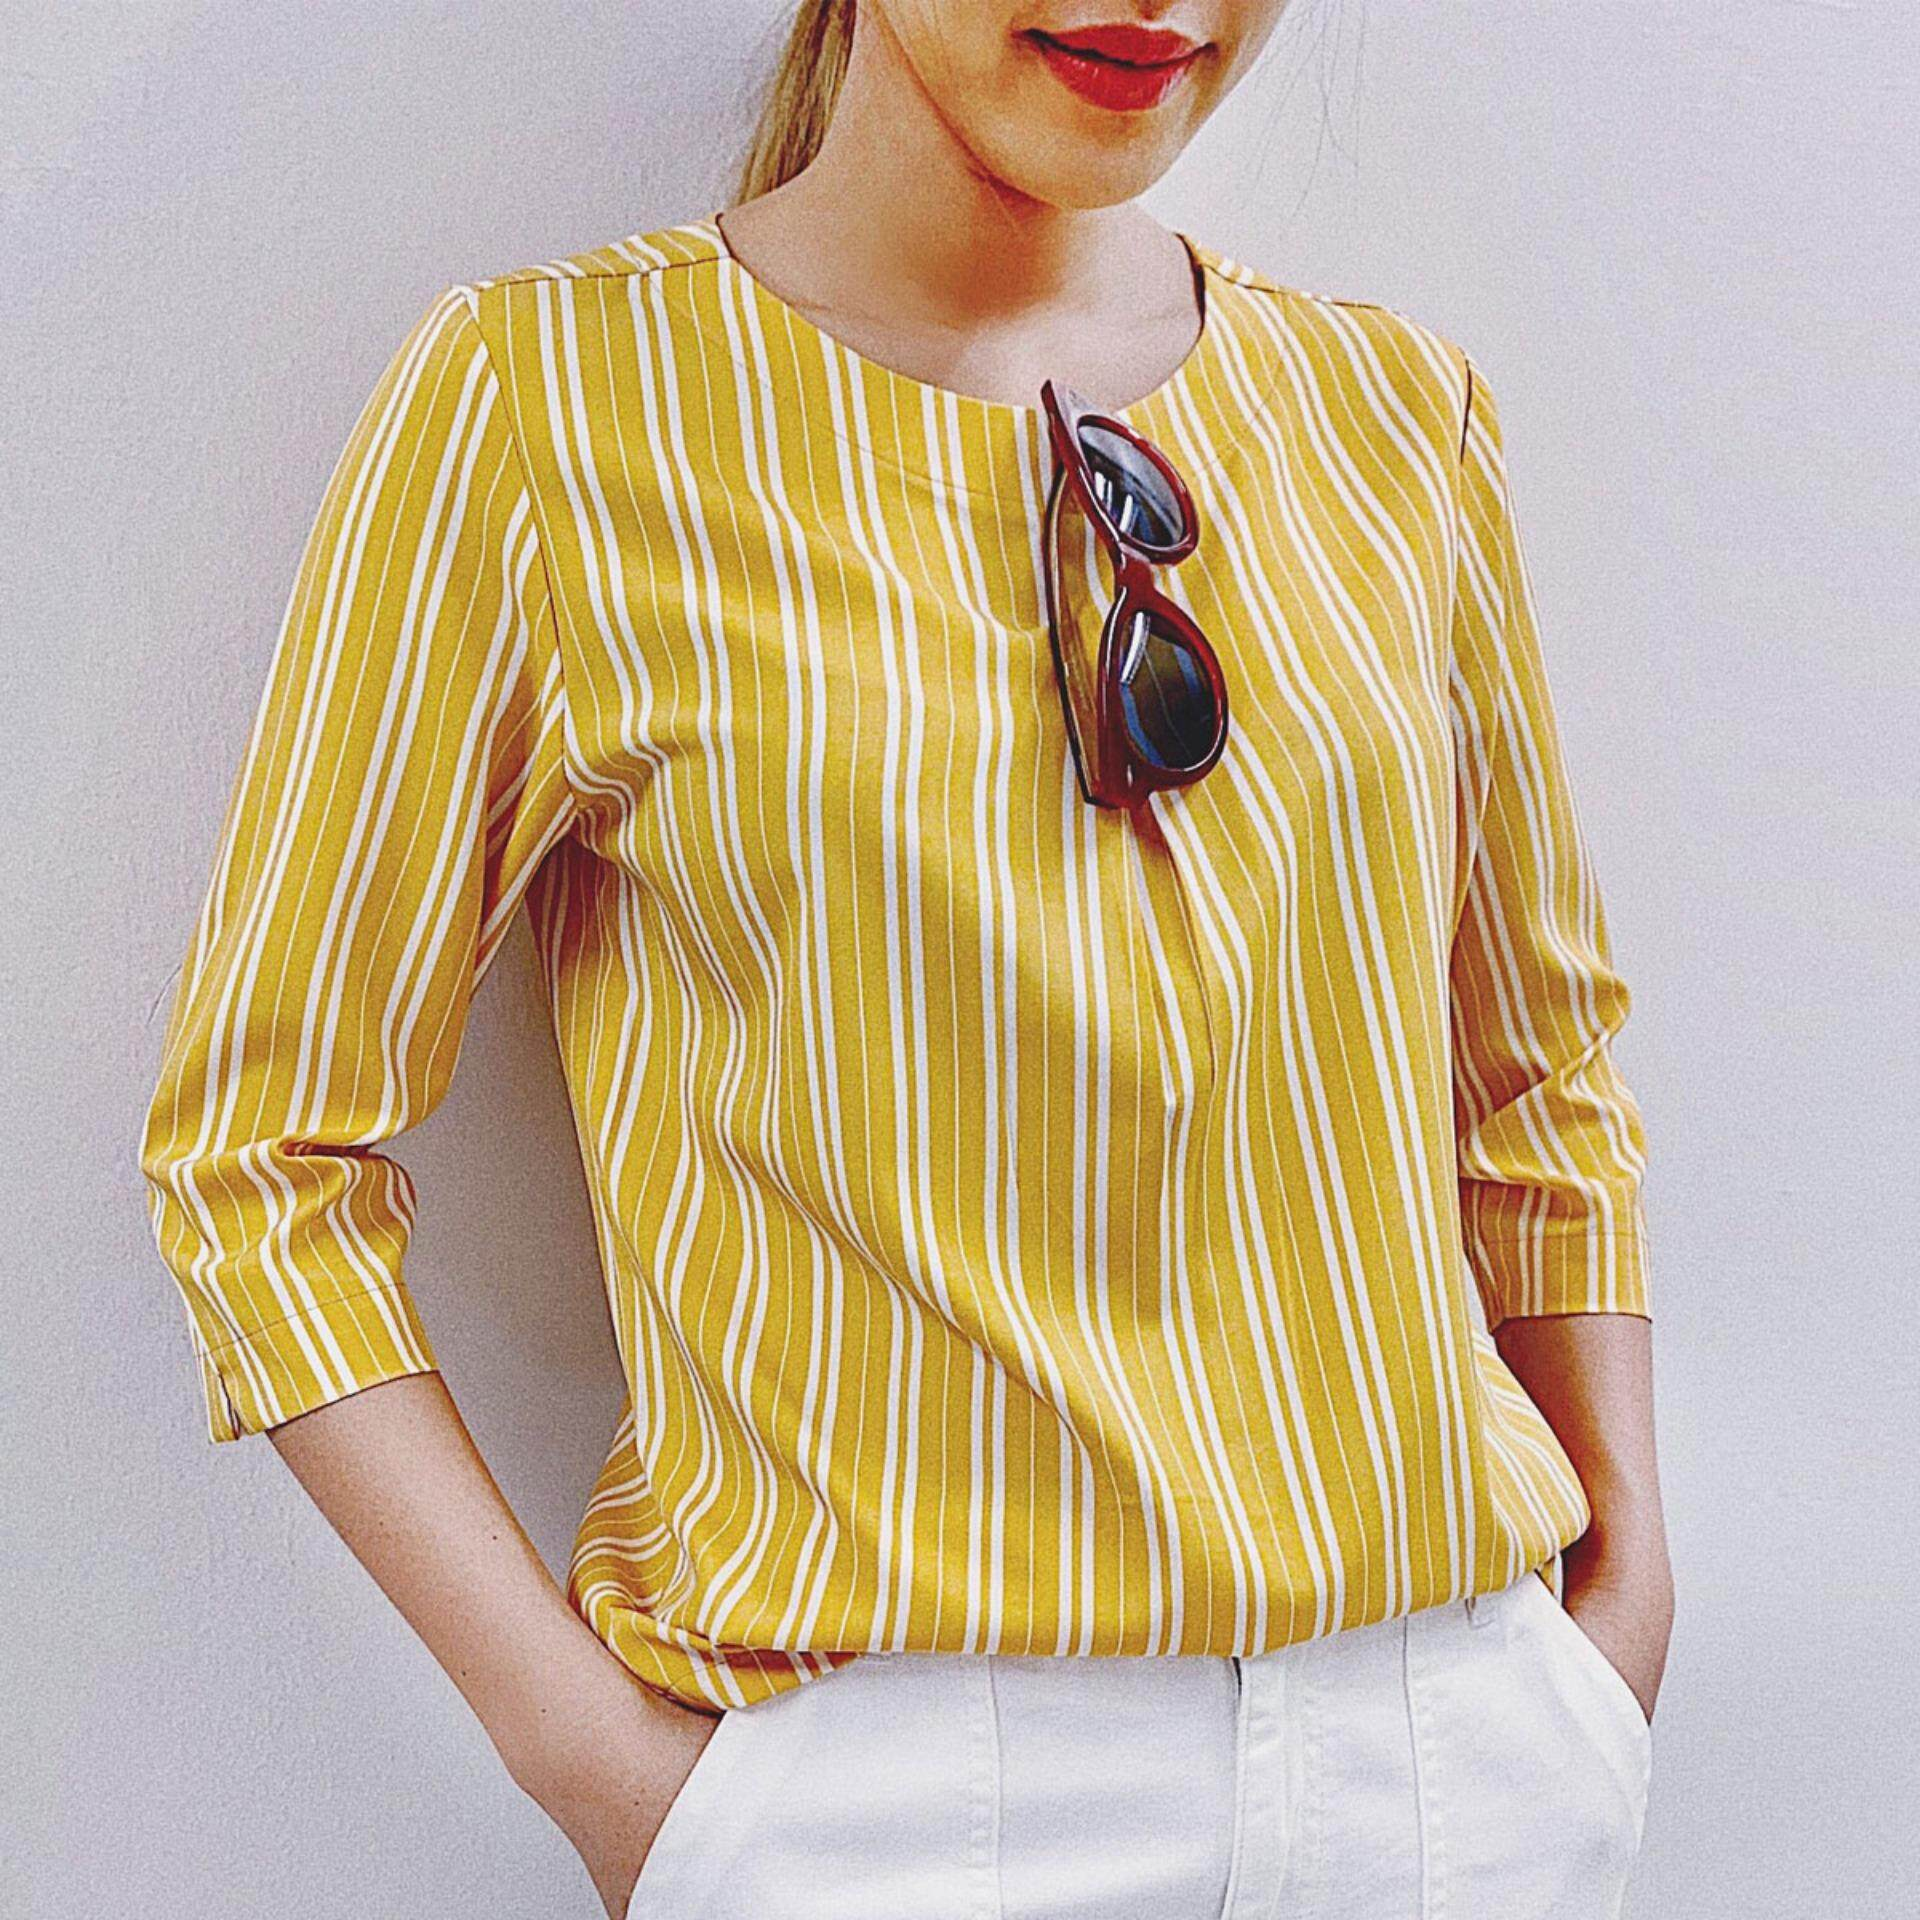 Portland Women เสื้อเบลาส์ แขนสามส่วน สีเหลือง